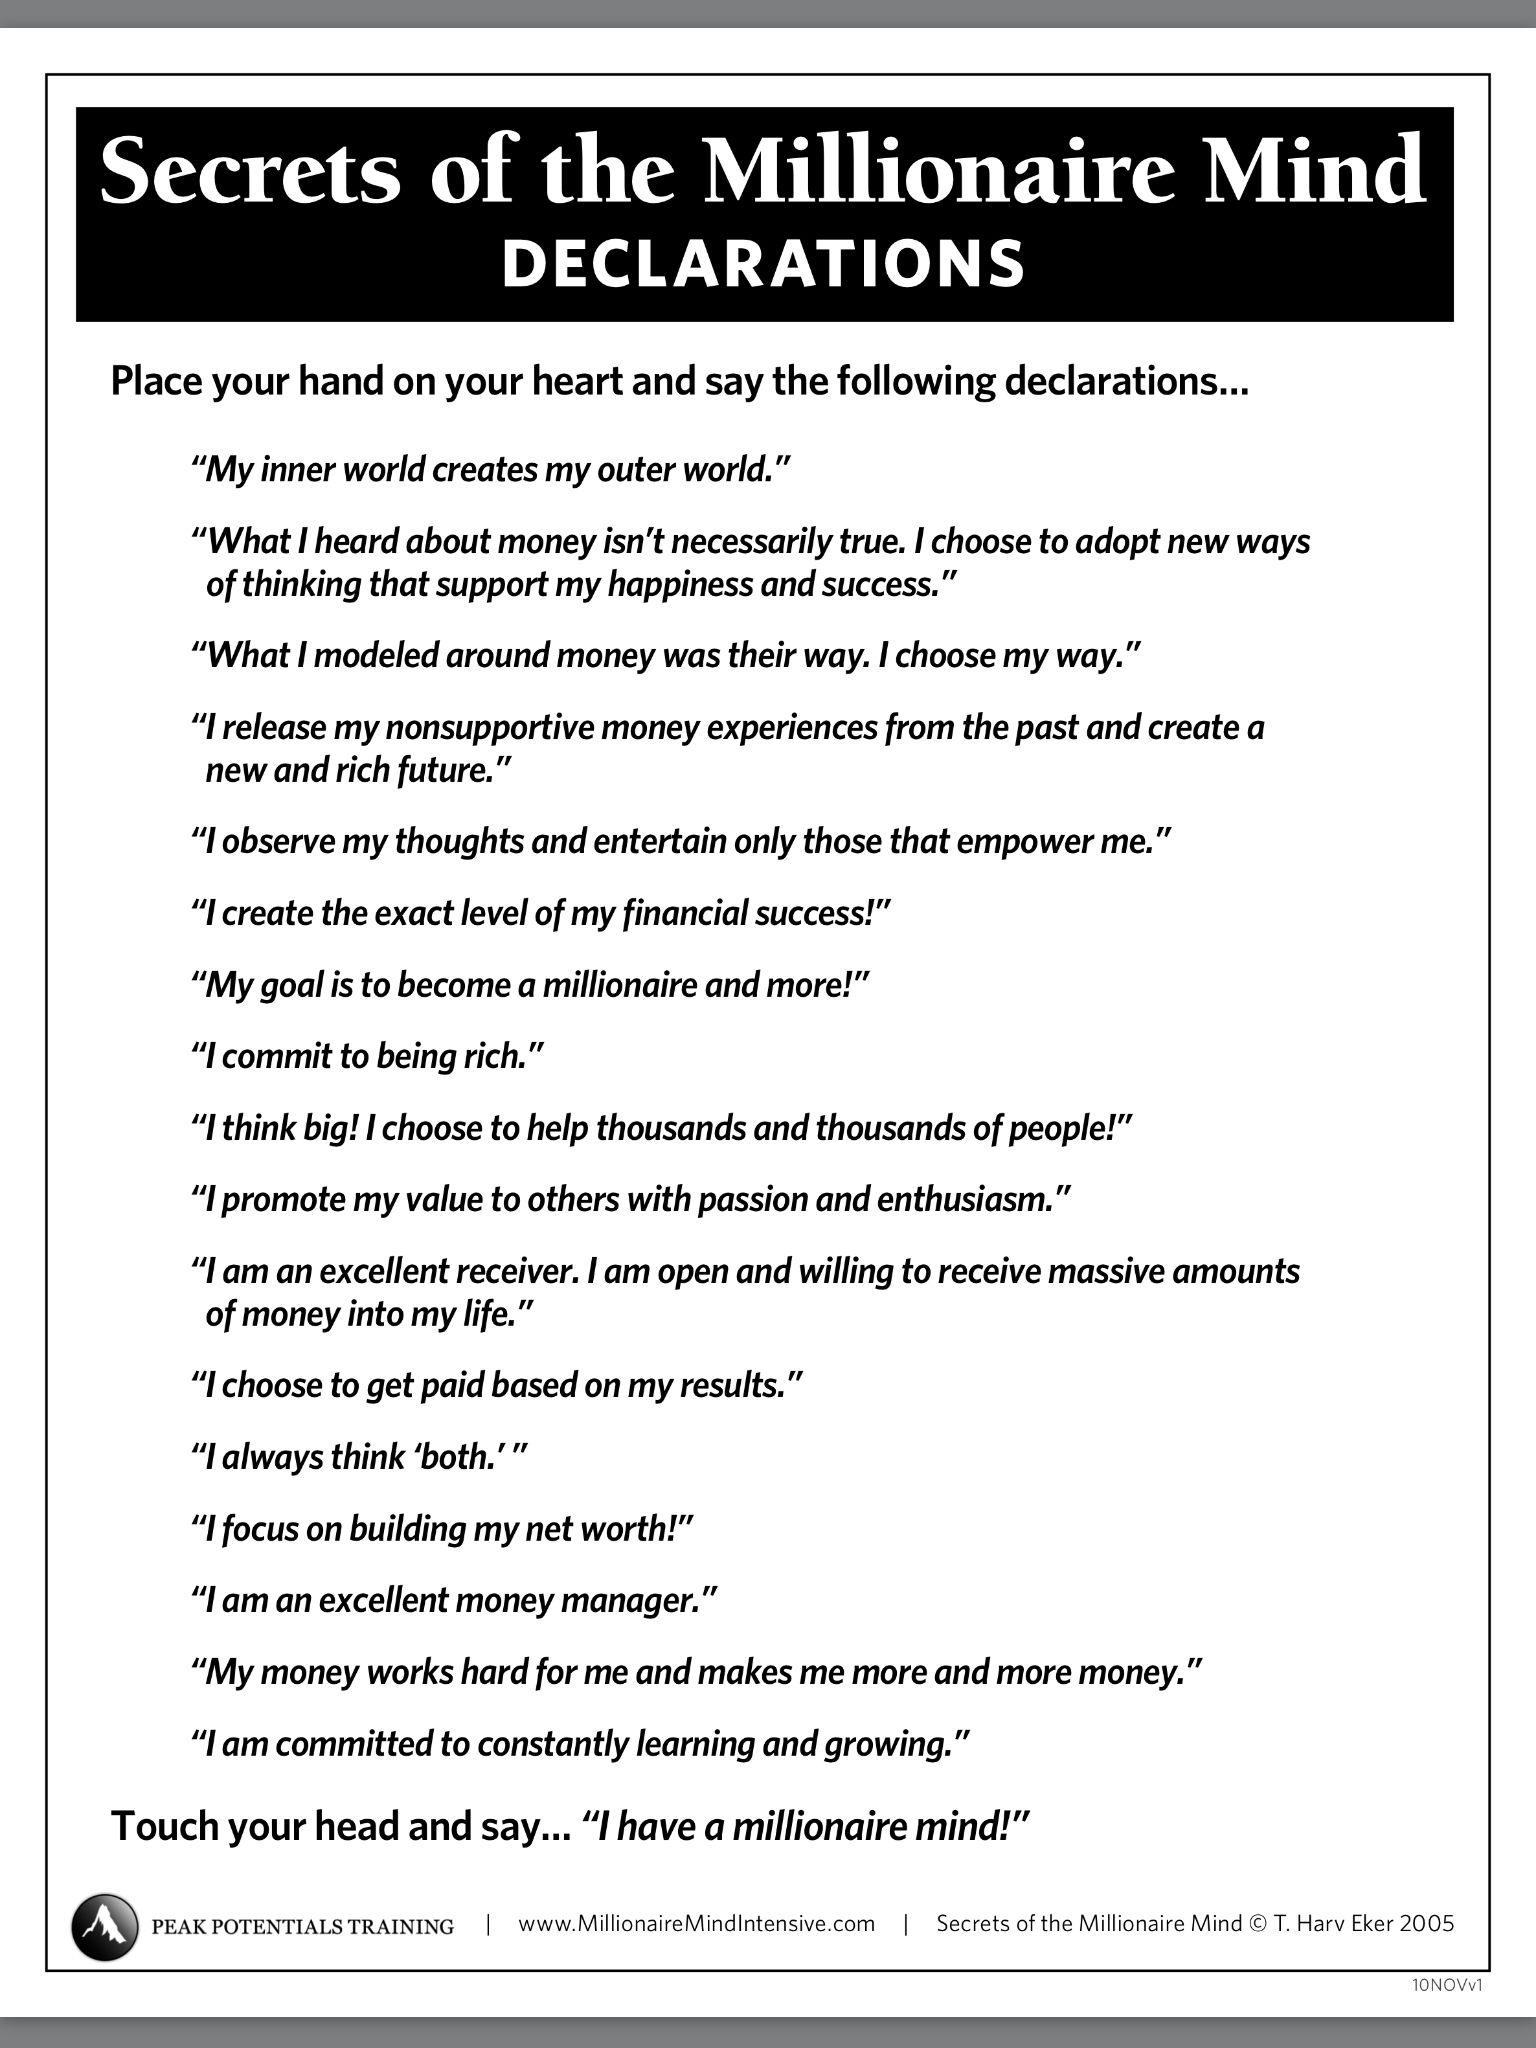 Secrets of a Millionaire Mind   Declarations   Pinterest   Boss babe